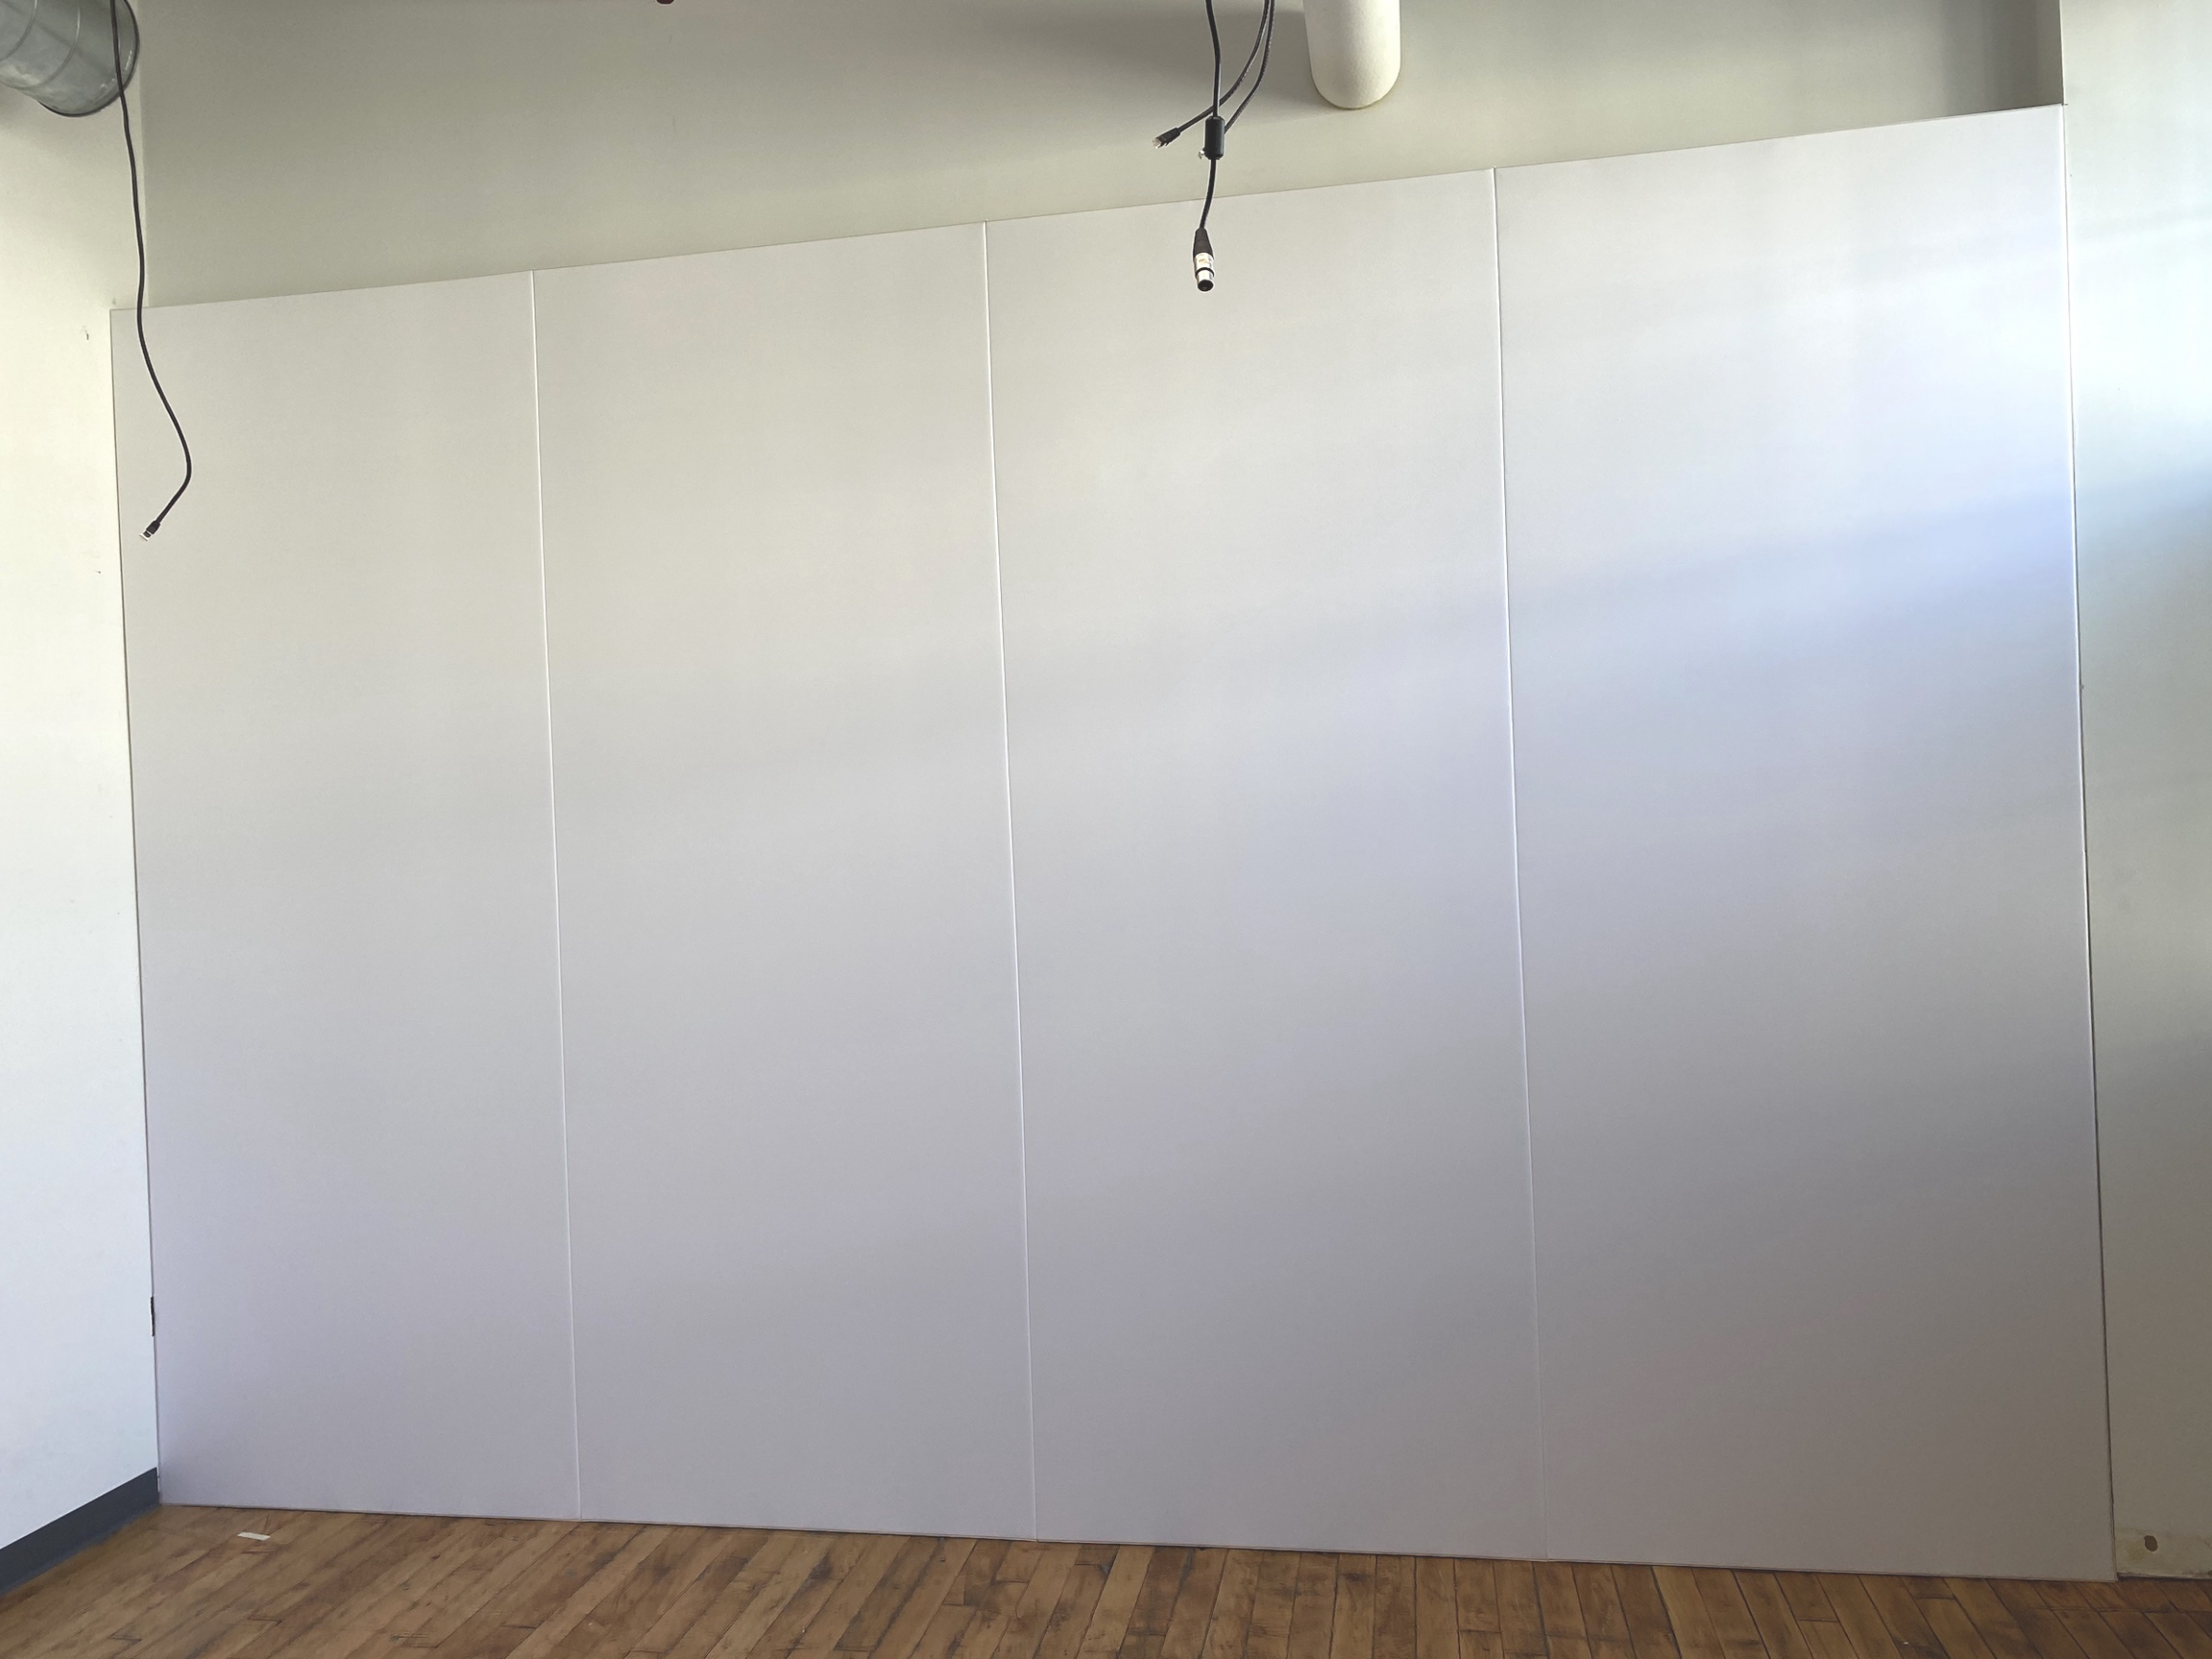 White Fabric Wall in Film Studio